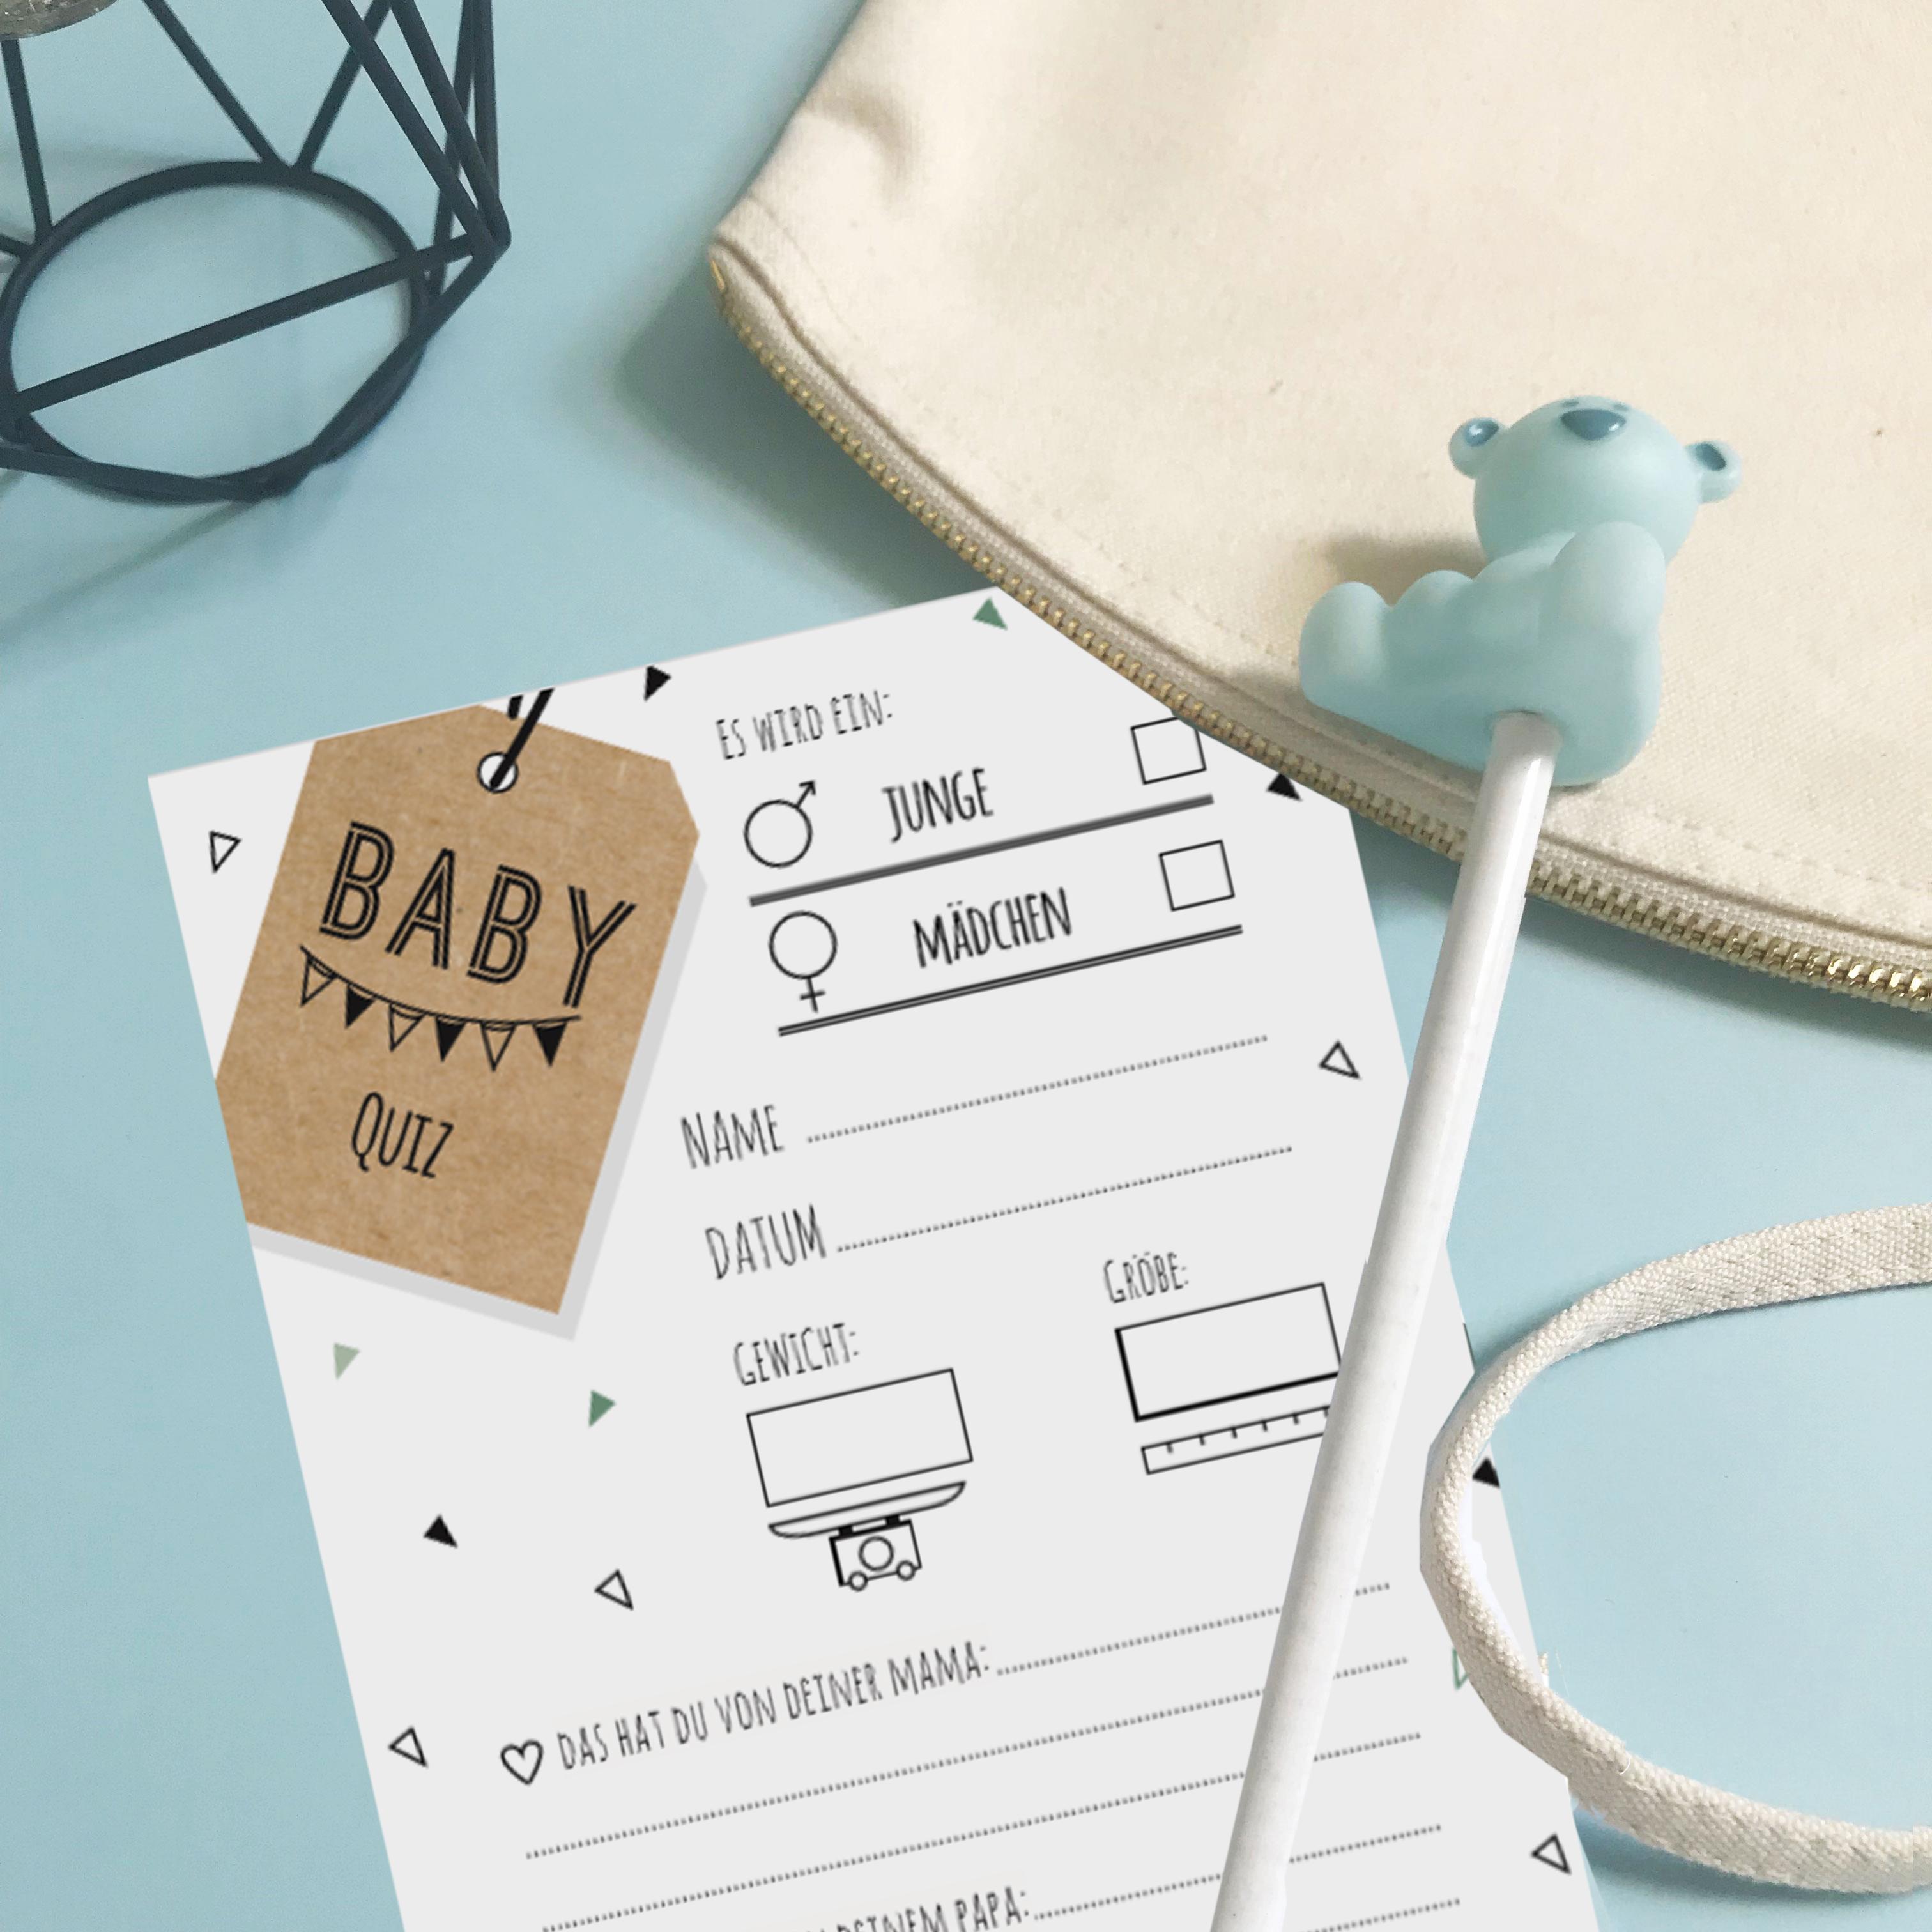 Babyshower-Quiz-free-printable - Tadaaz Blog